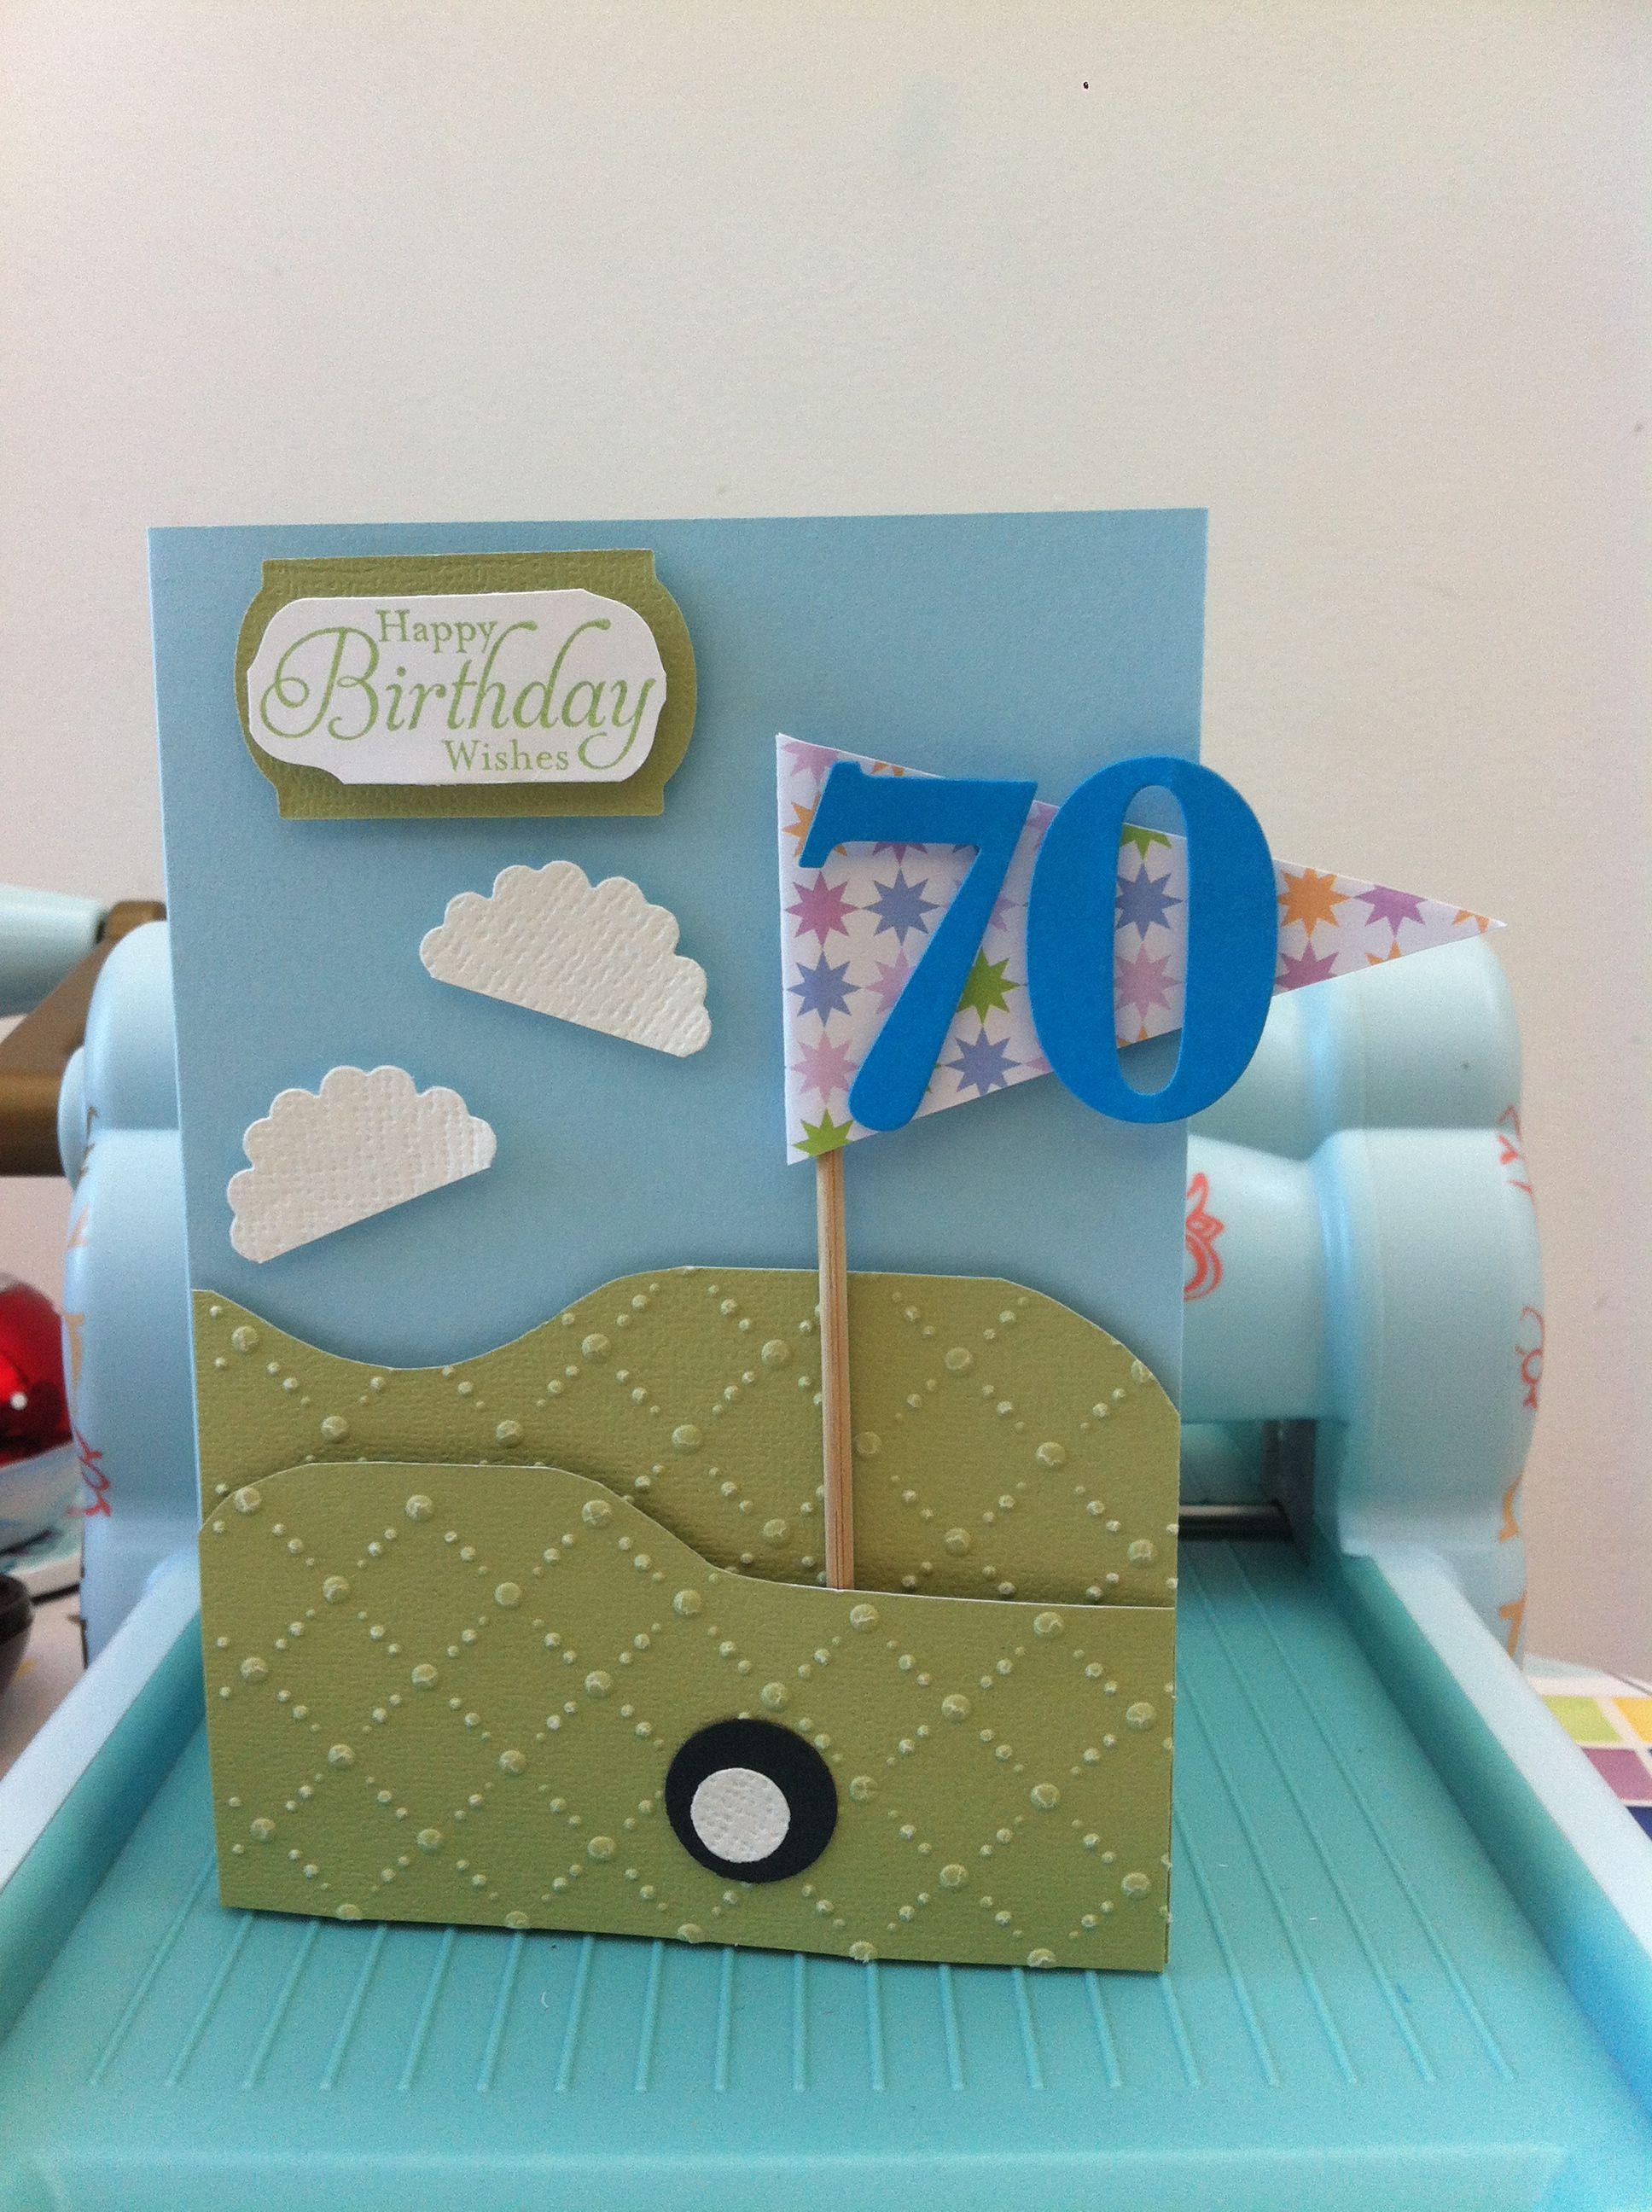 Pin By Rachel Meredith On Crafts Big Birthday Cards 70th Birthday Card Dad Birthday Card